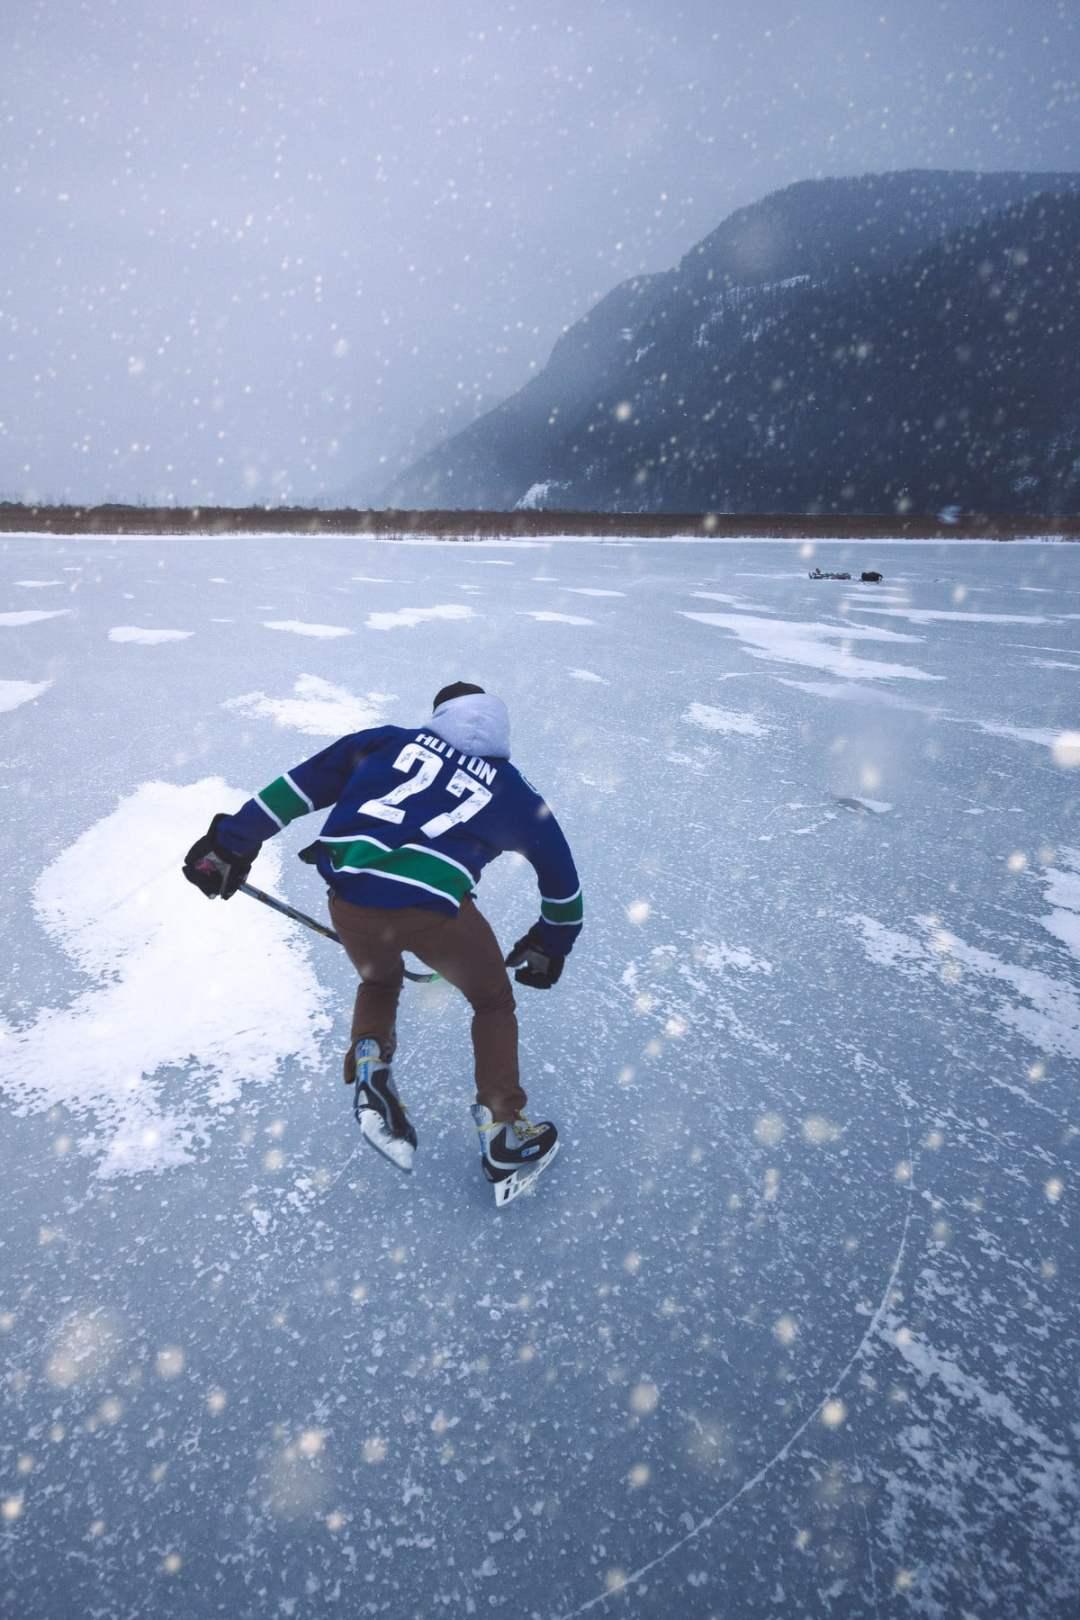 DerekPondHockeySNOW2.jpg